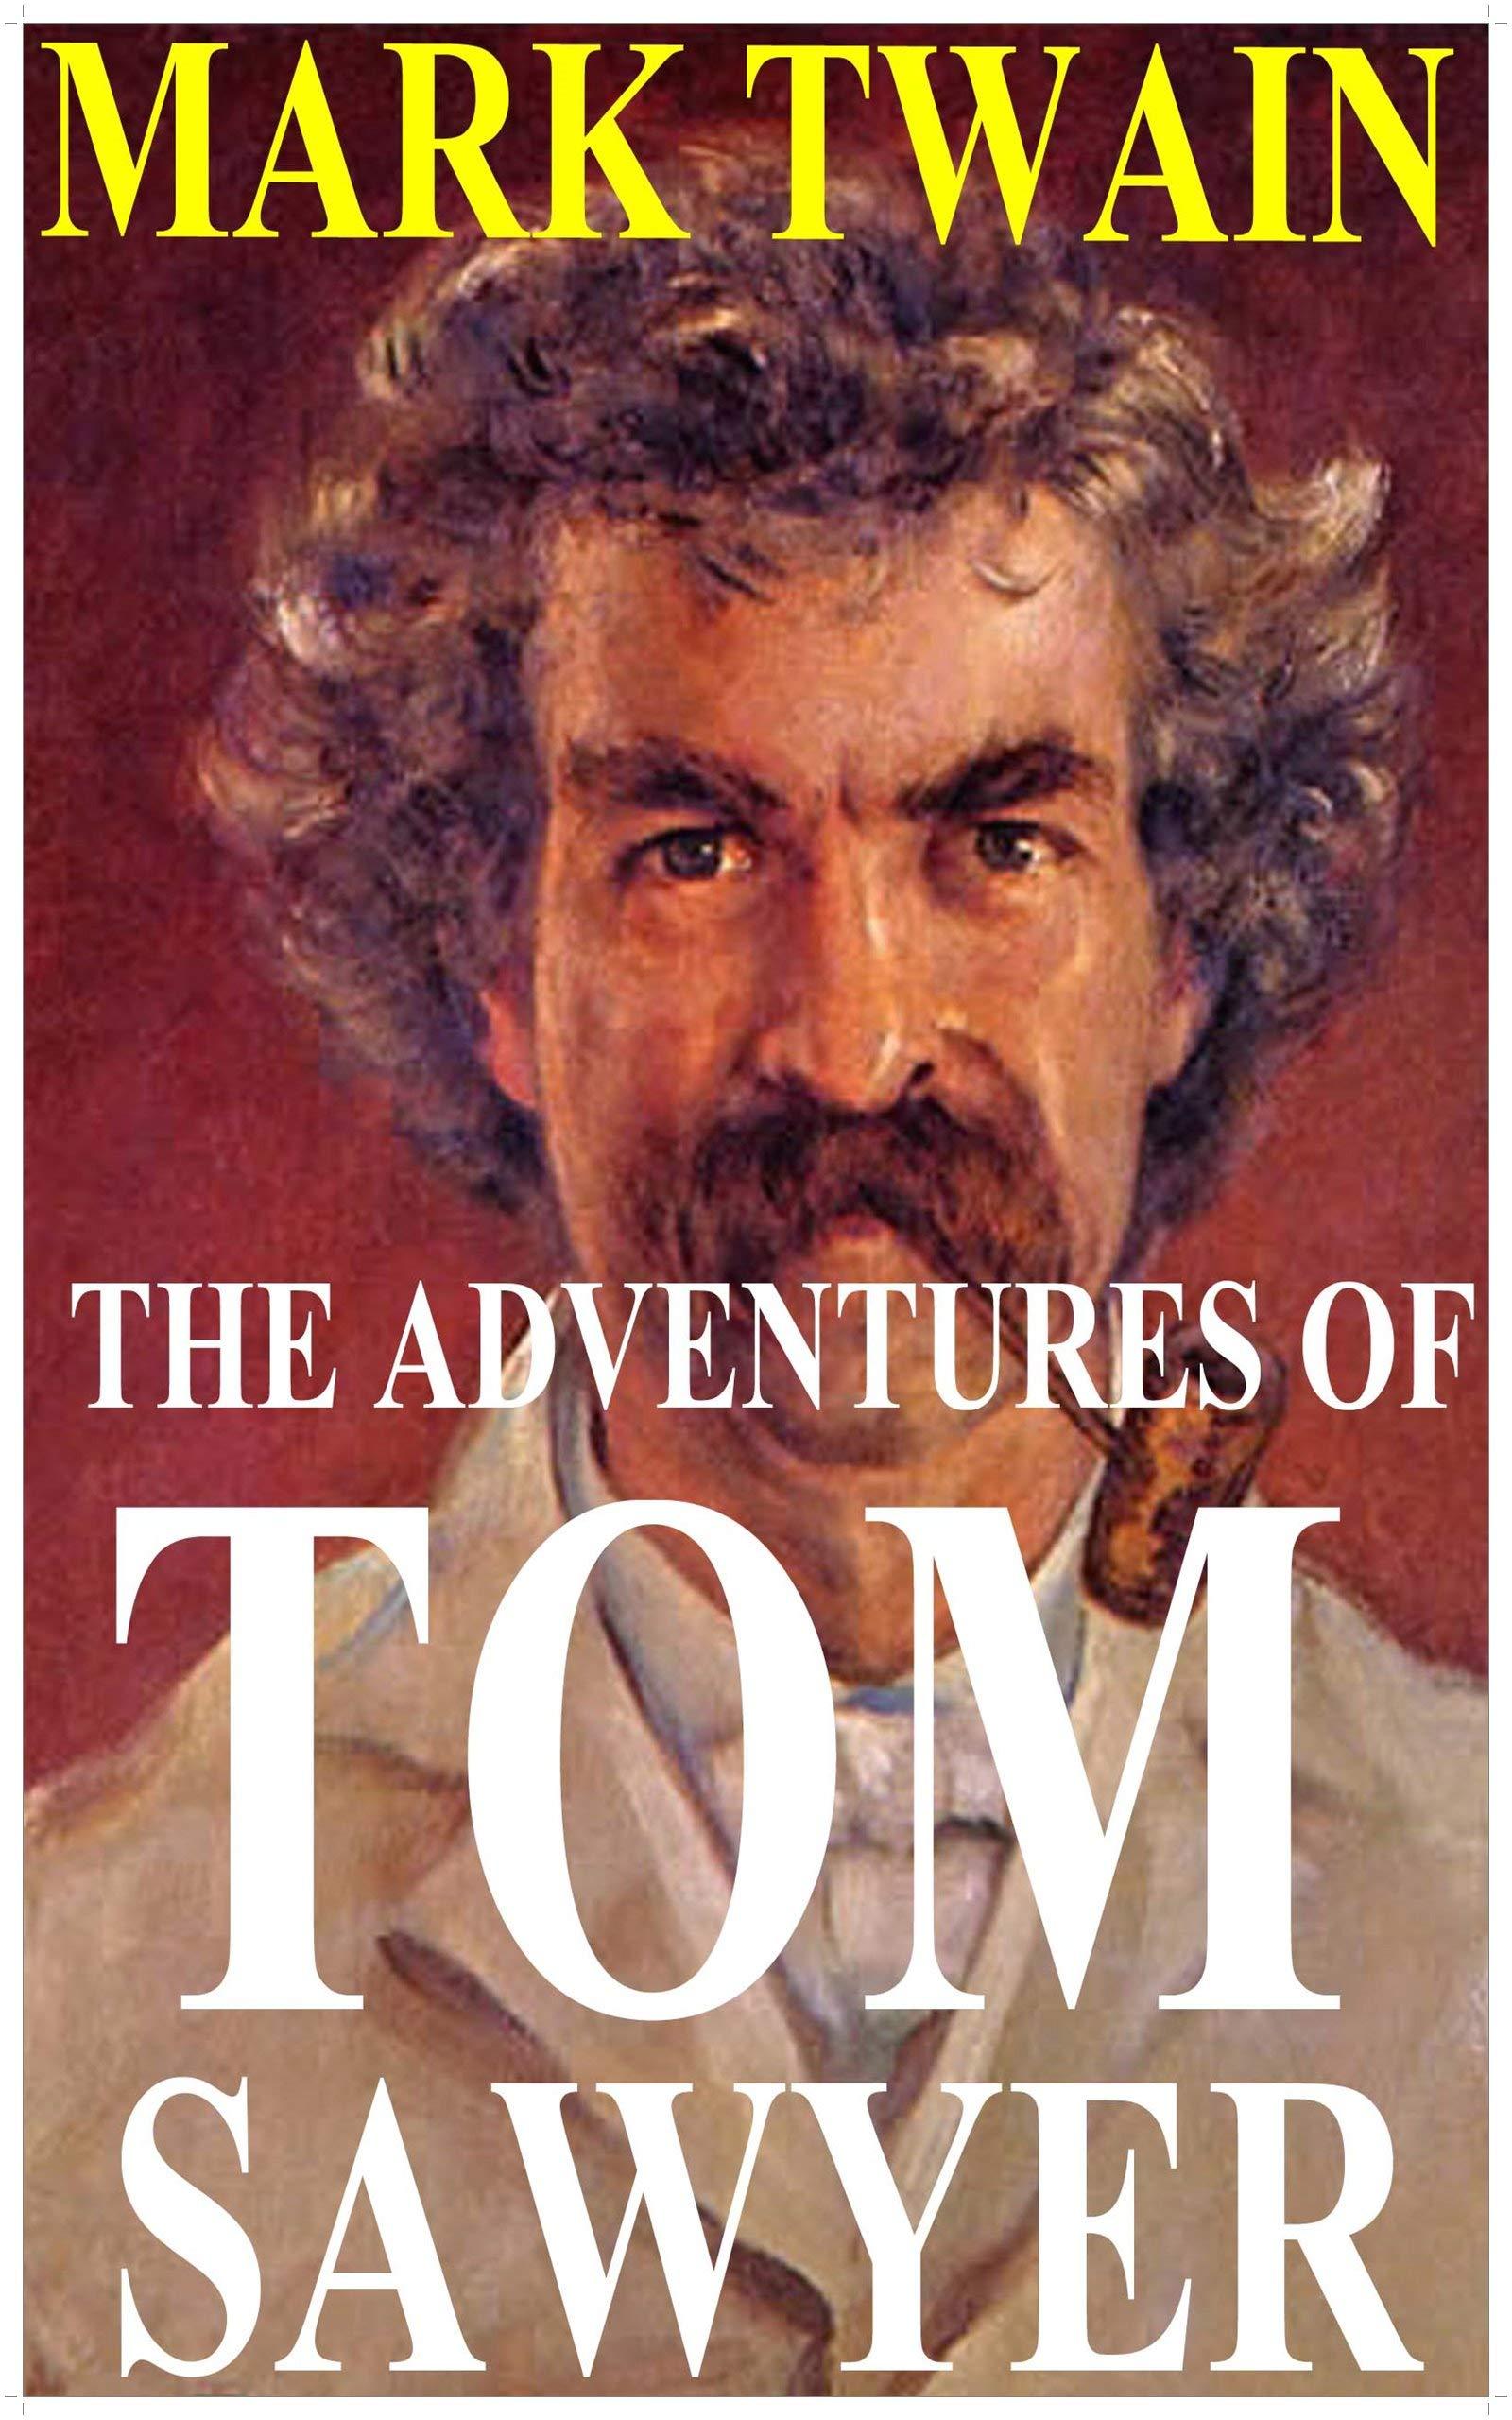 The Adventures of Tom Sawyer by Mark Twain (Illustrated) por Mark Twain